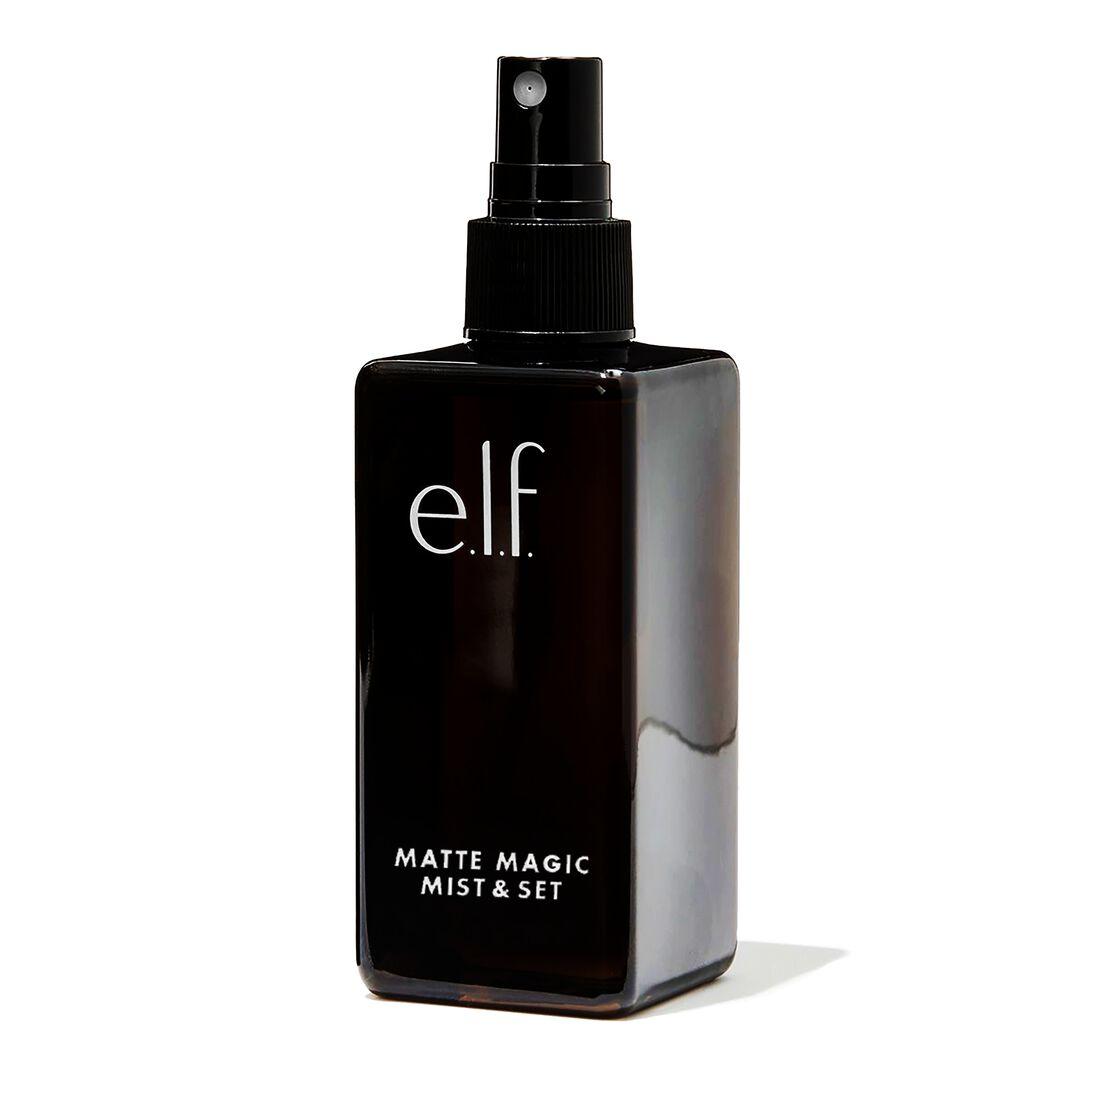 ELF Cosmetics - Matte Magic Mist & Set - Large